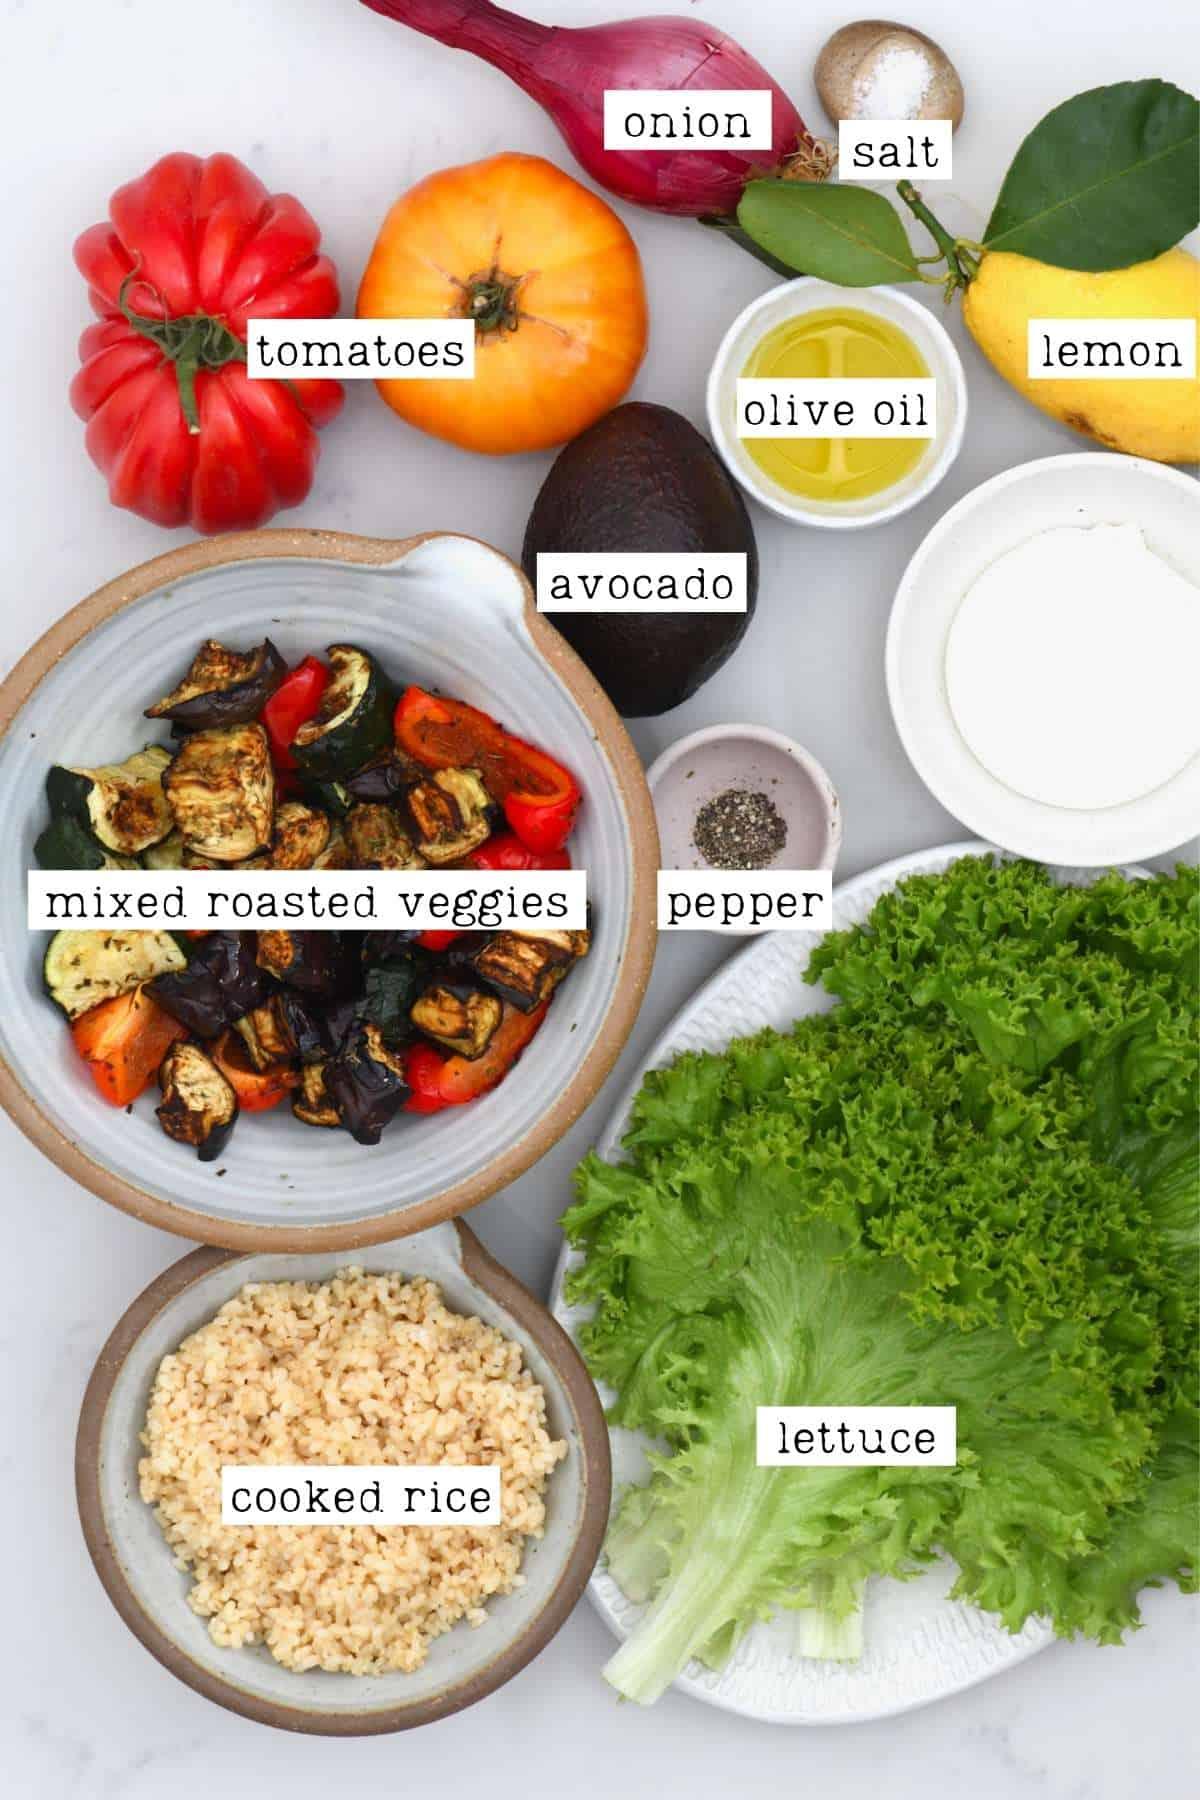 Ingredients for roasted vegetable salad